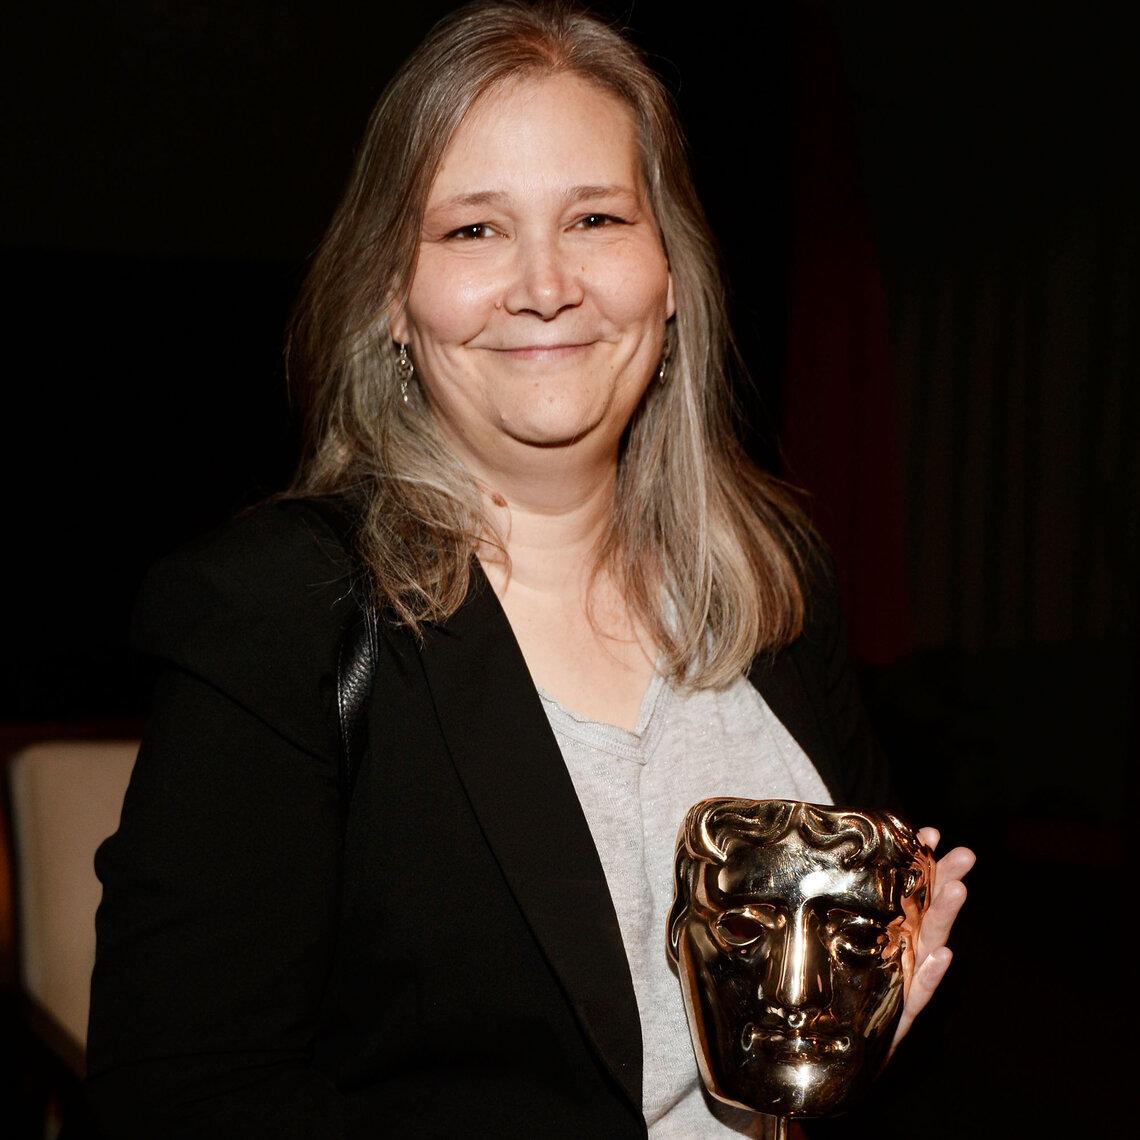 BAFTA LA Celebrates Amy Hennig